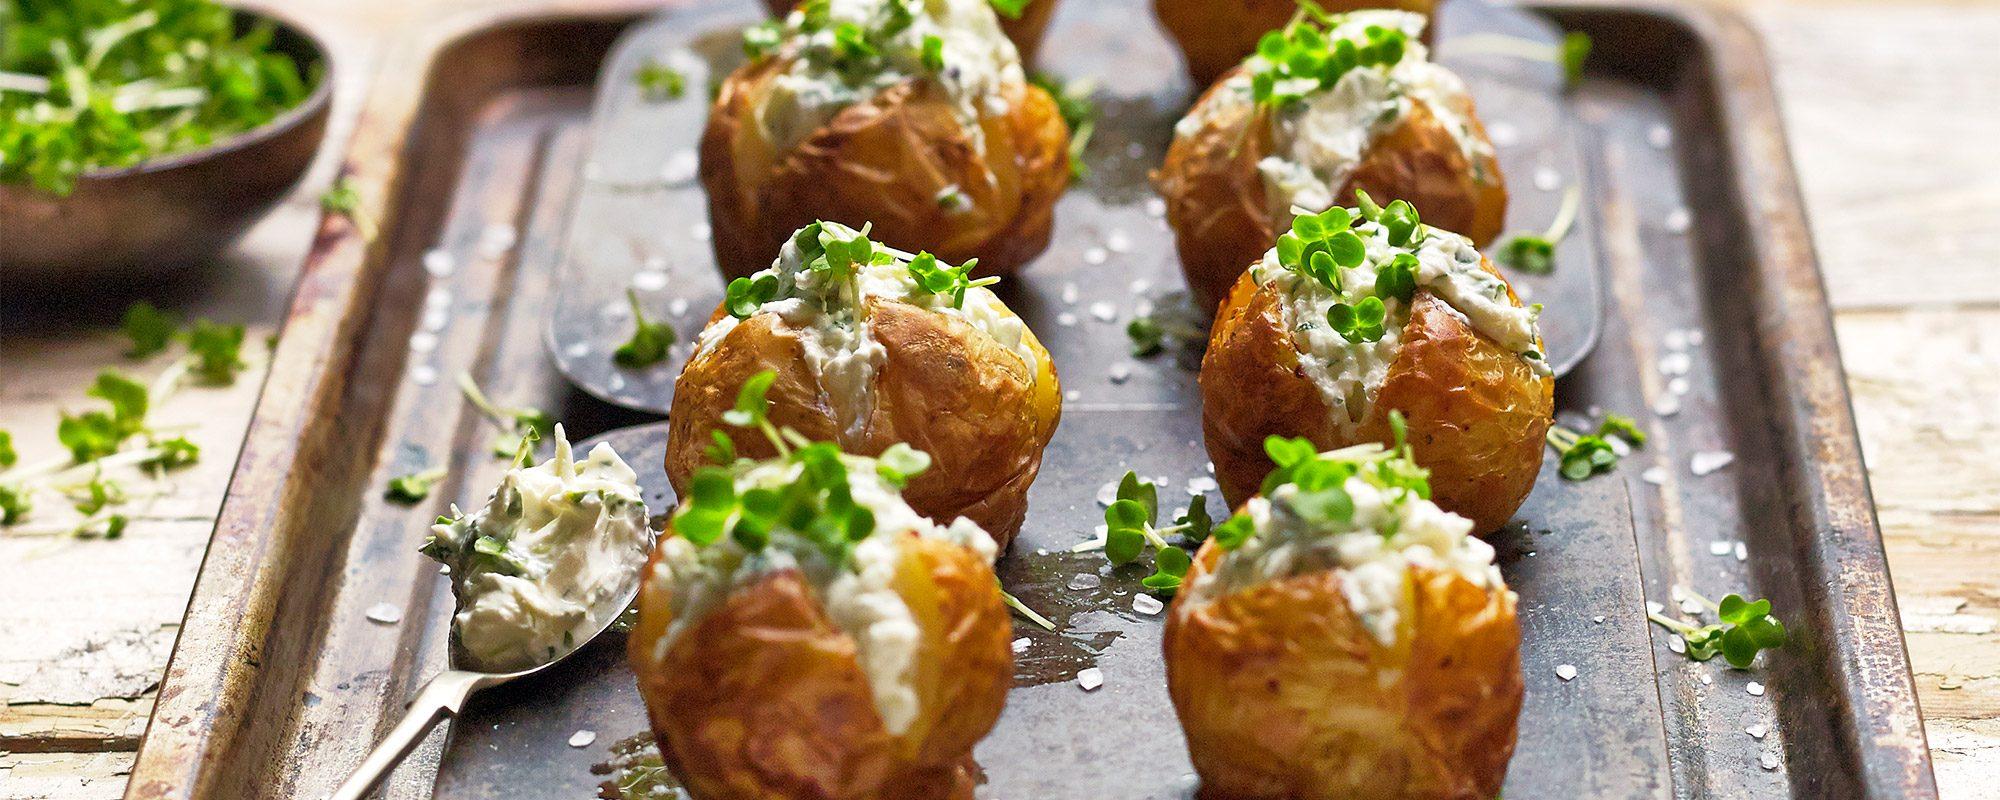 Mini Jacket Potatoes with Salad Cress Cream Cheese